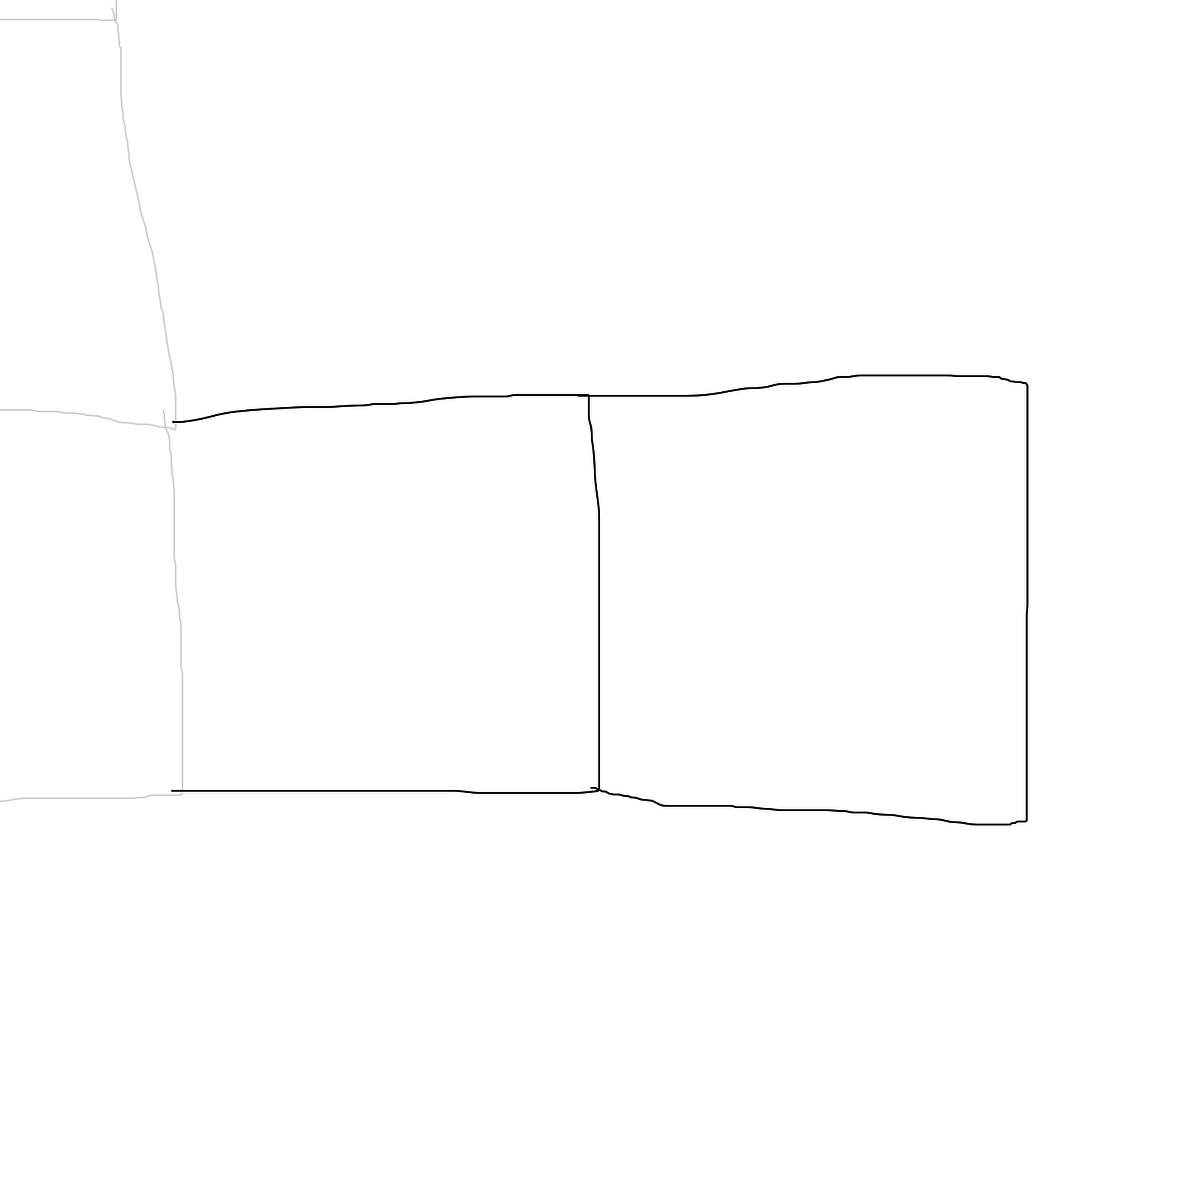 BAAAM drawing#18820 lat:55.7507057189941400lng: 37.6163330078125000